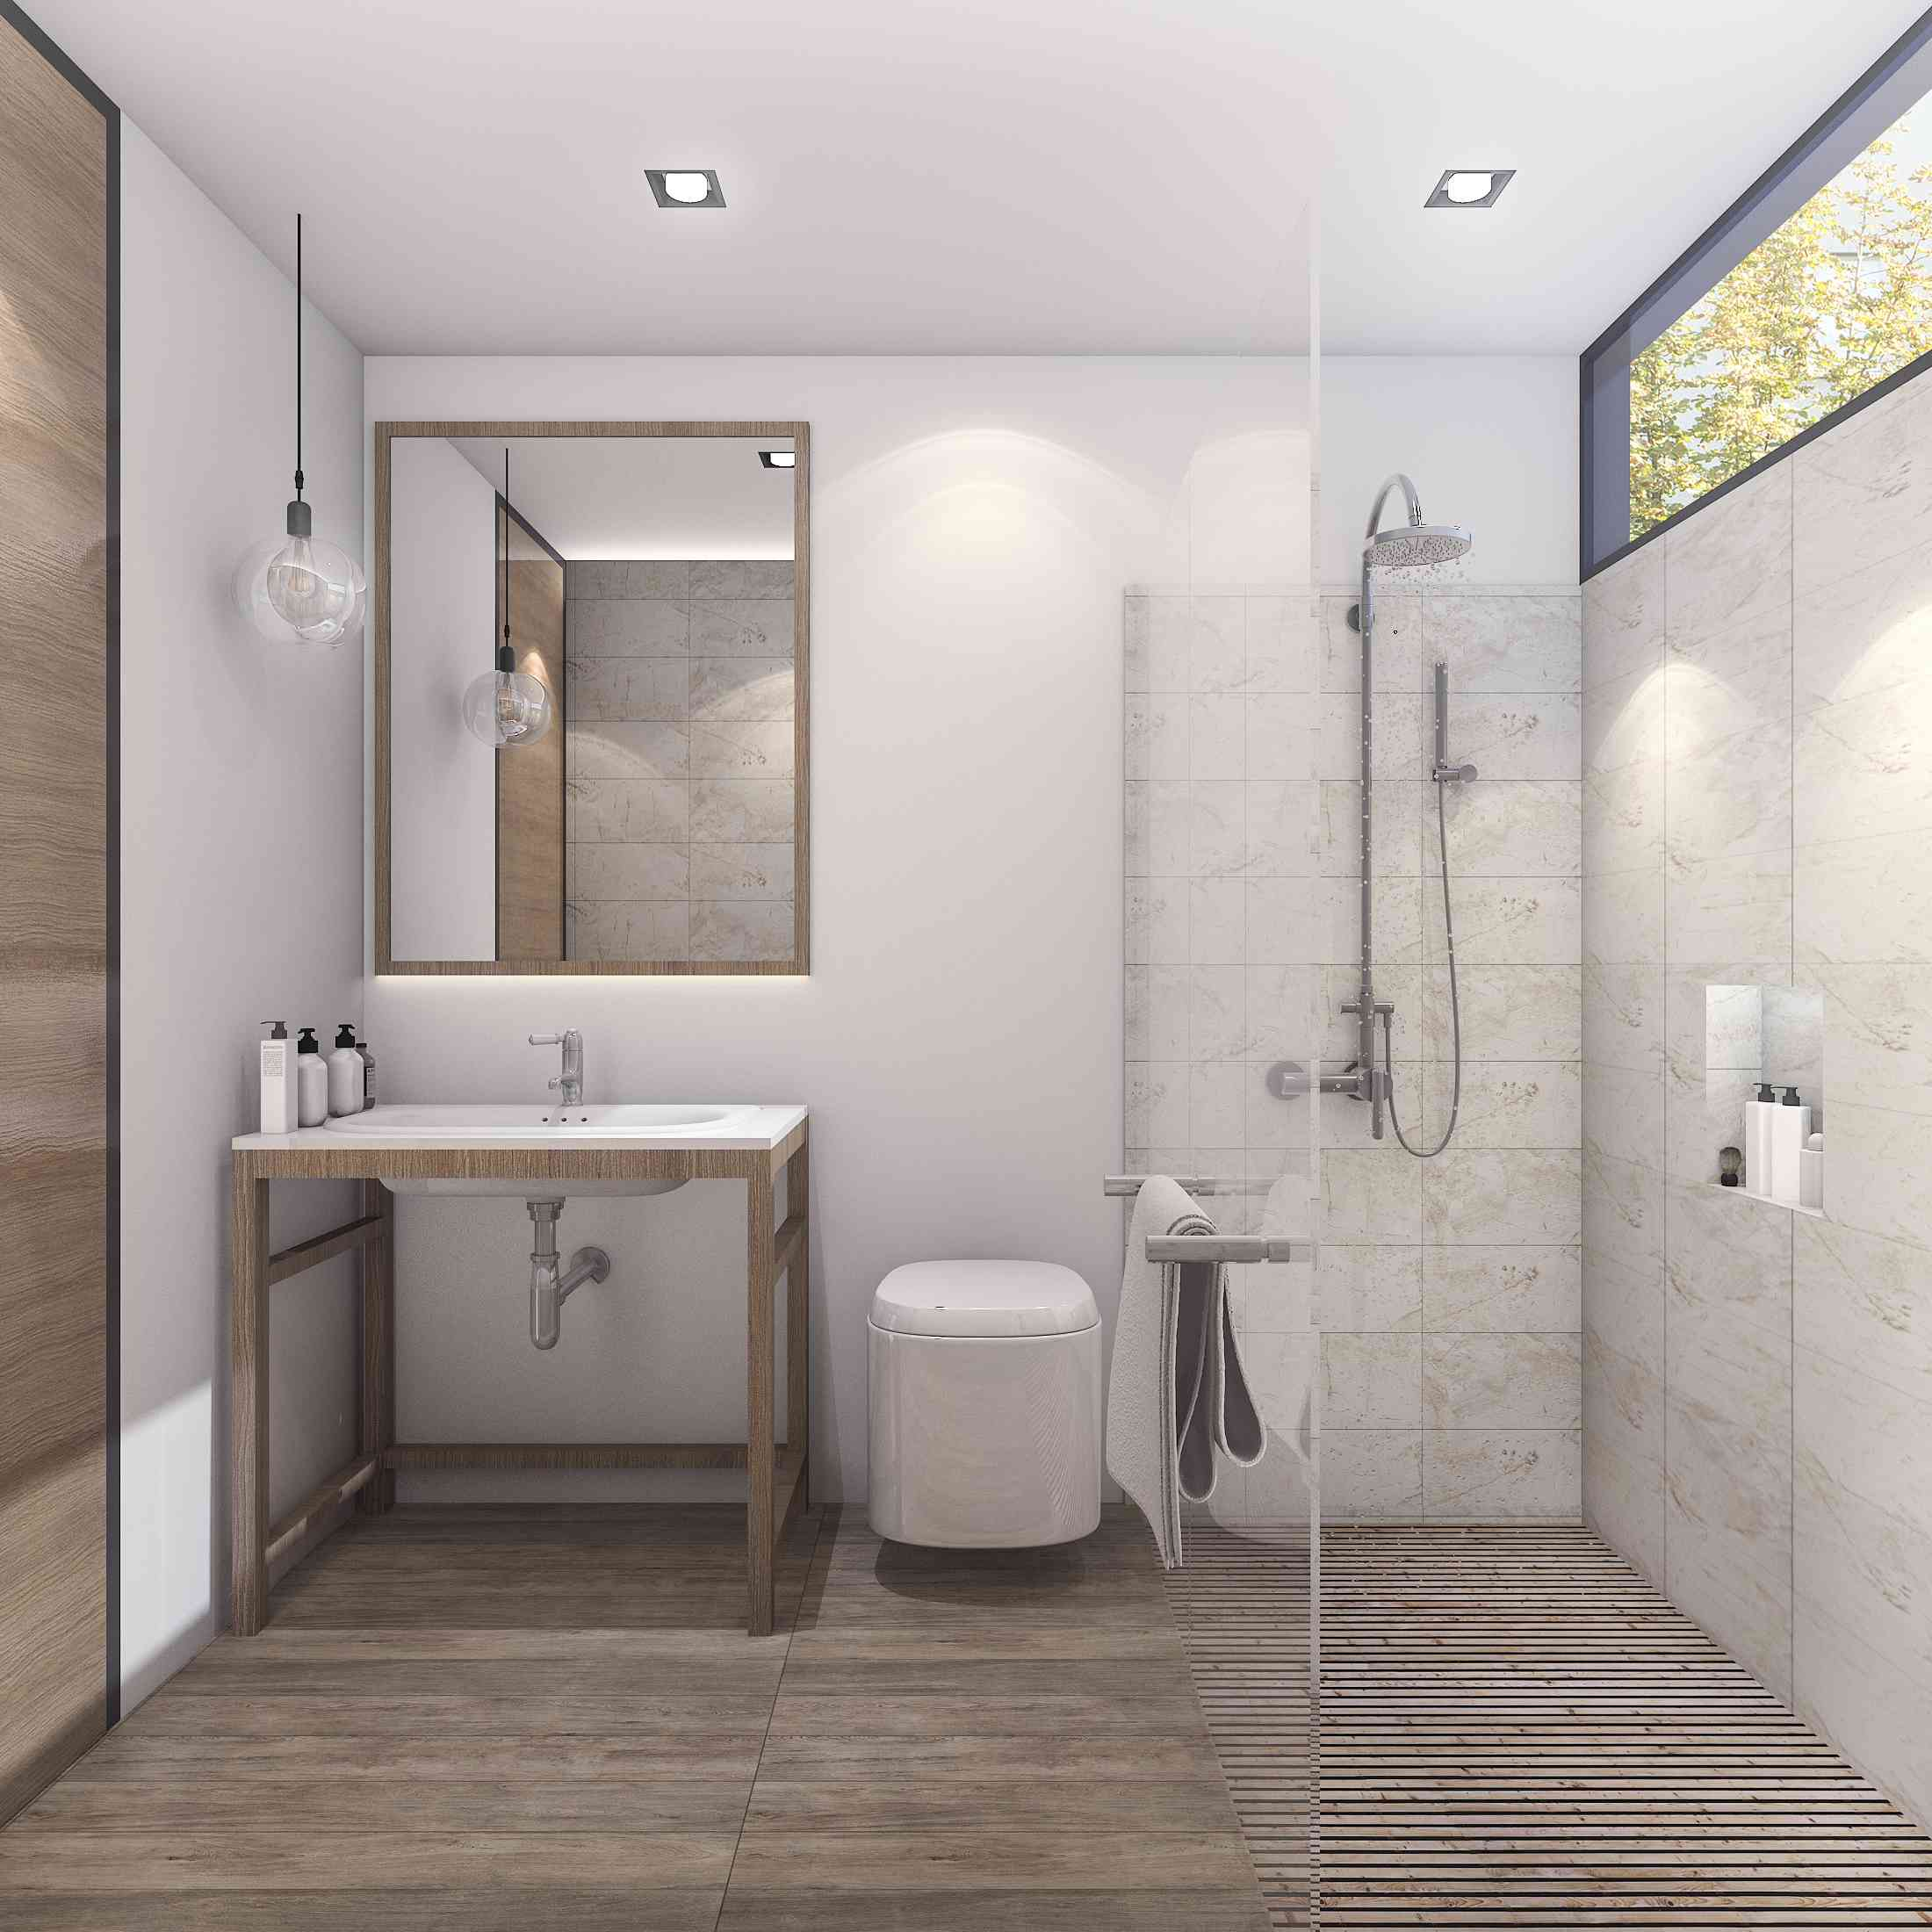 5 types of bathroom lighting